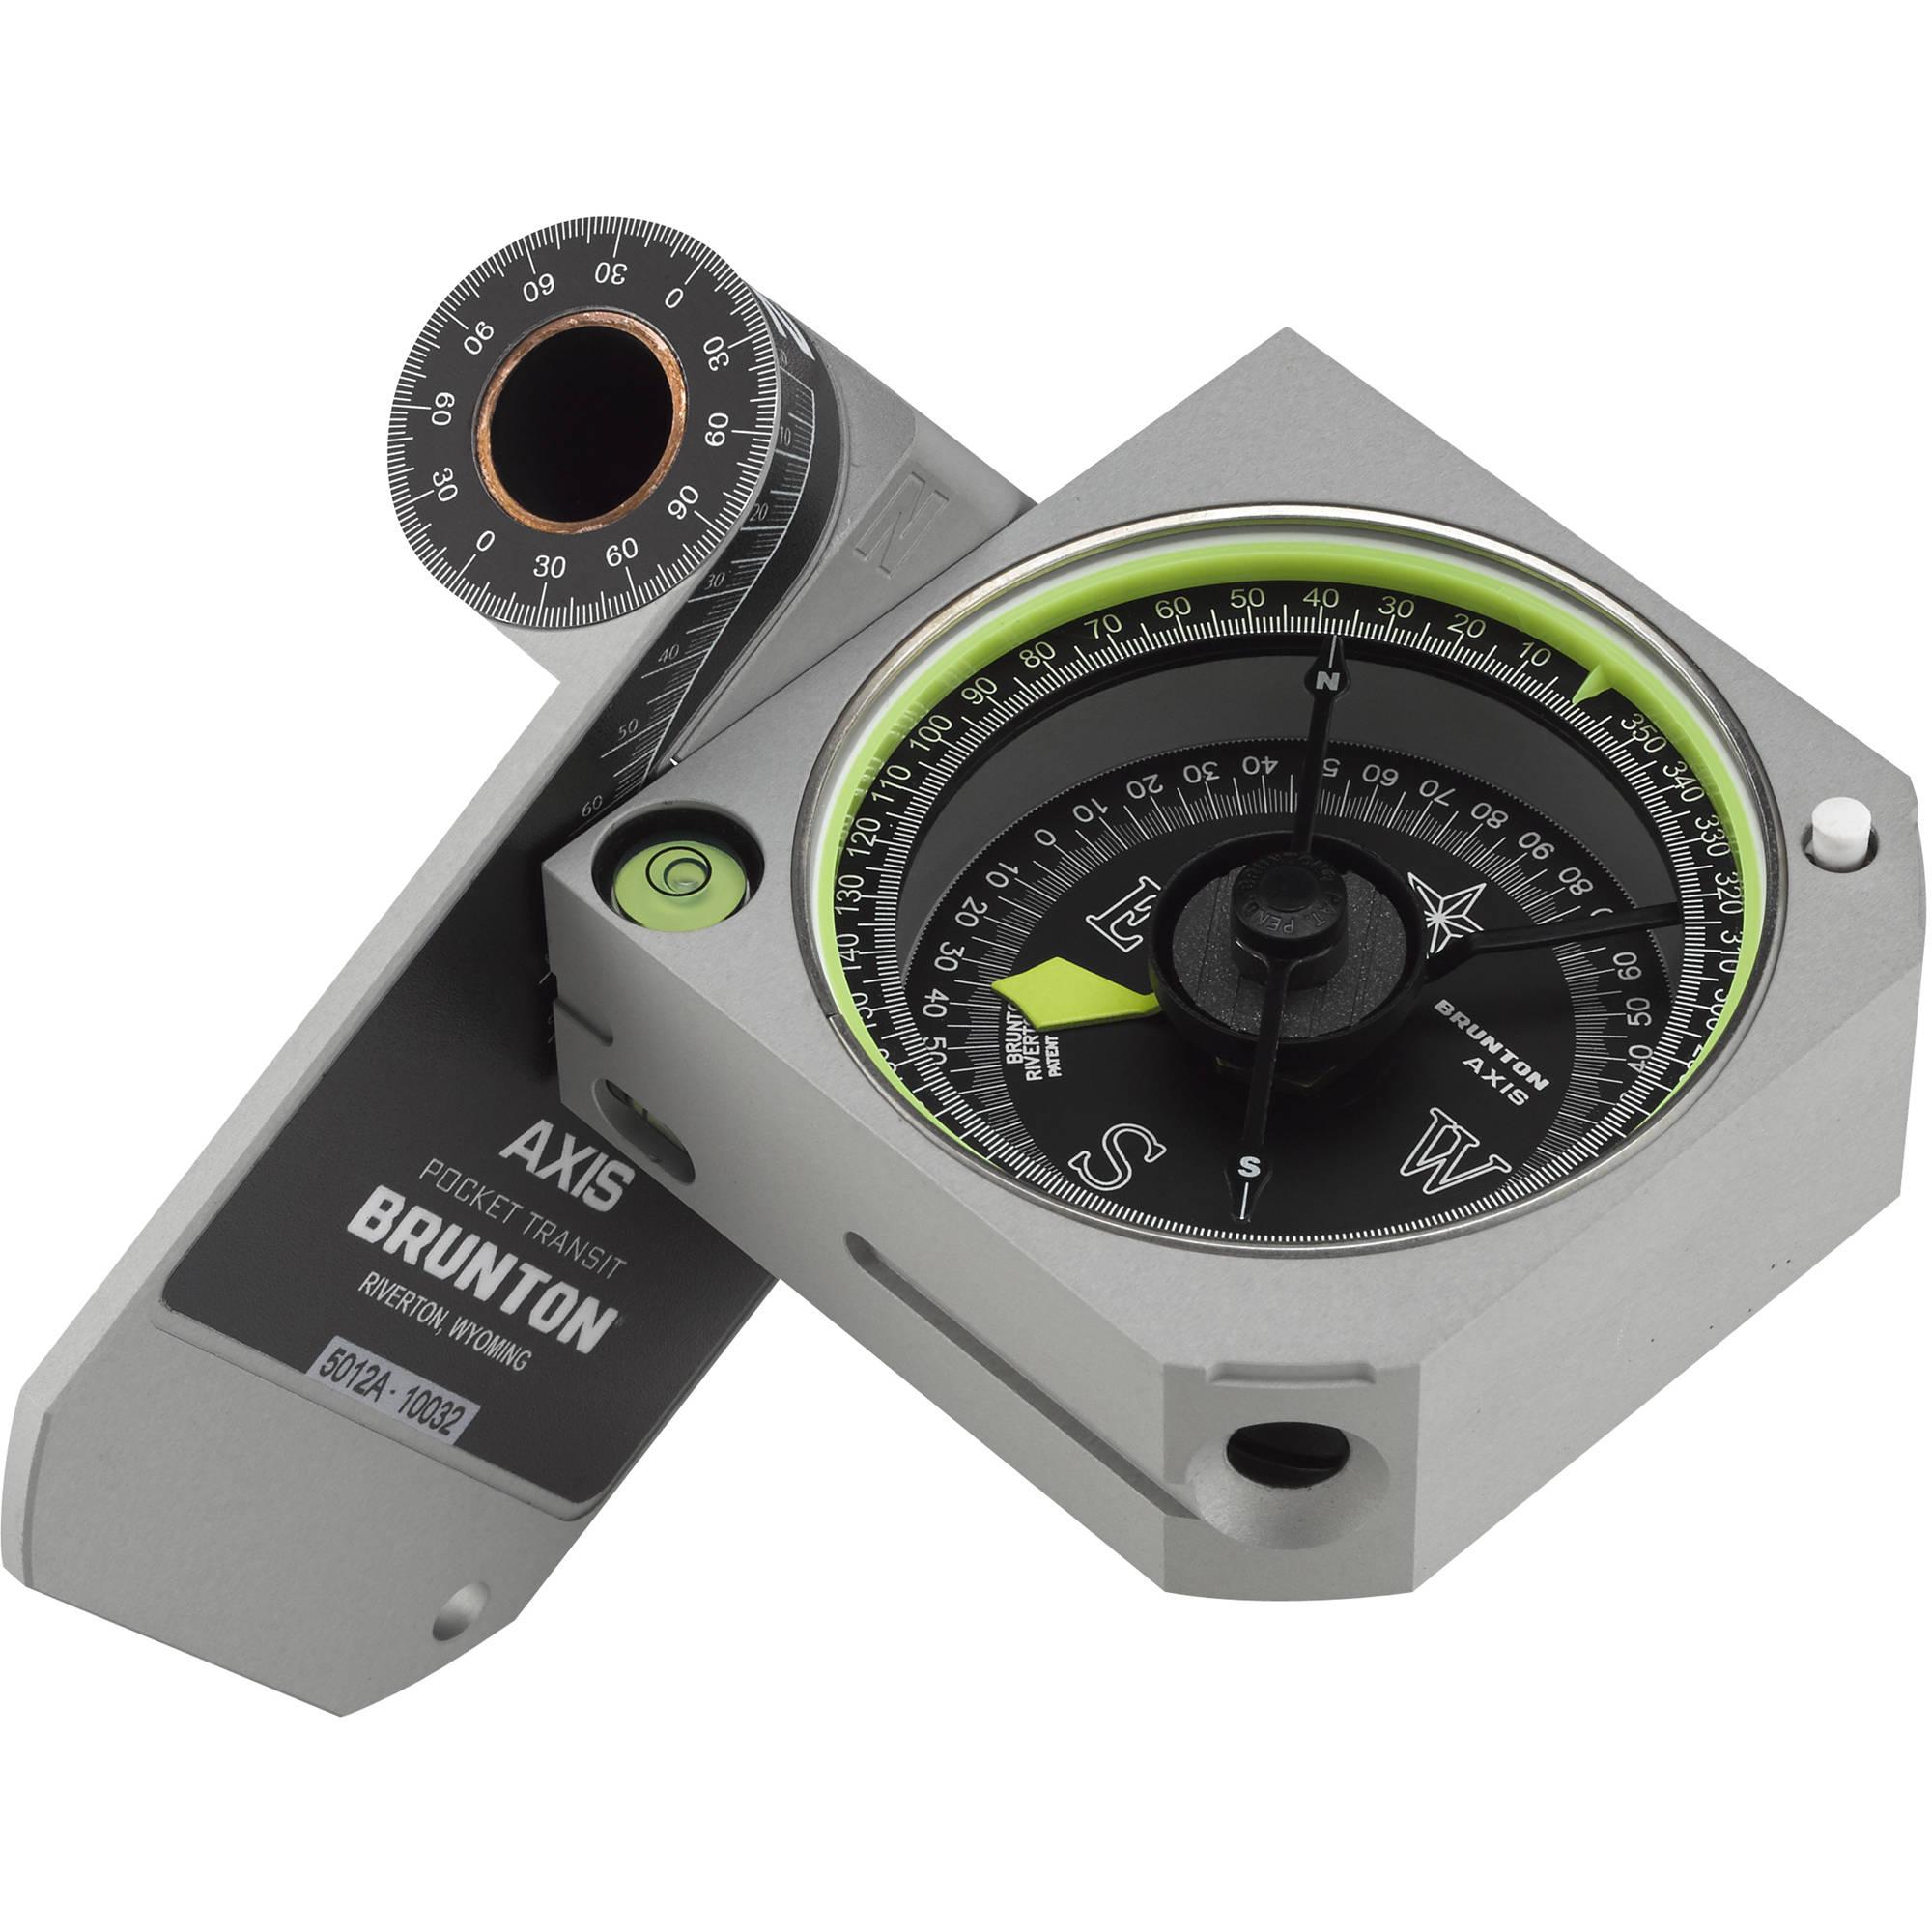 Hasil gambar untuk Compass Brunton Axis /5012